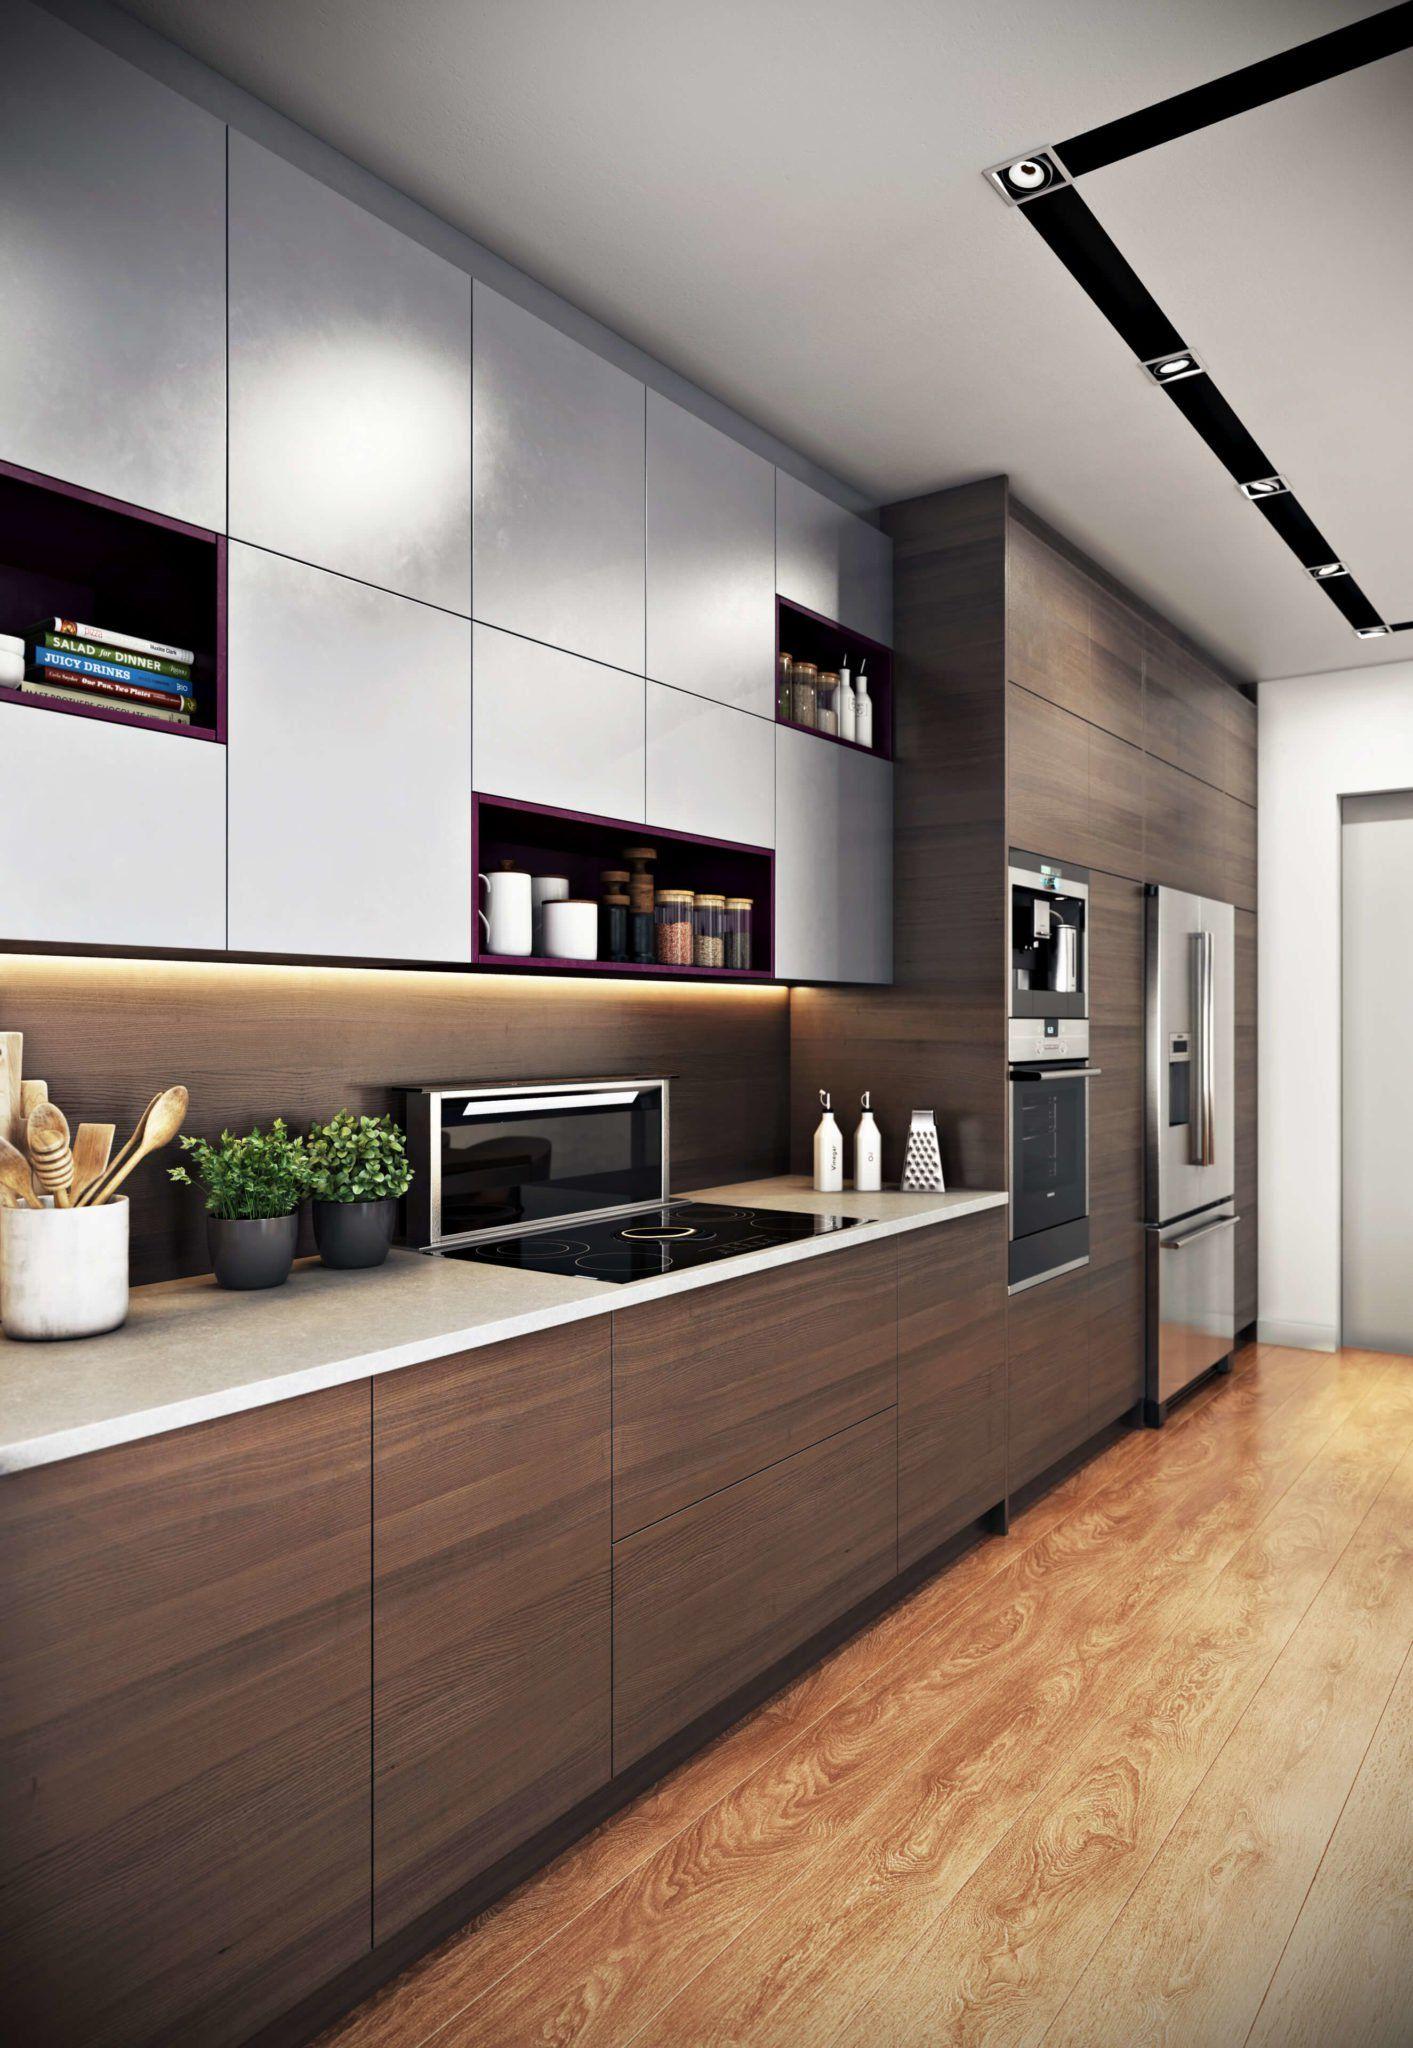 Kitchen Interior 3D Rendering for a Modern Design